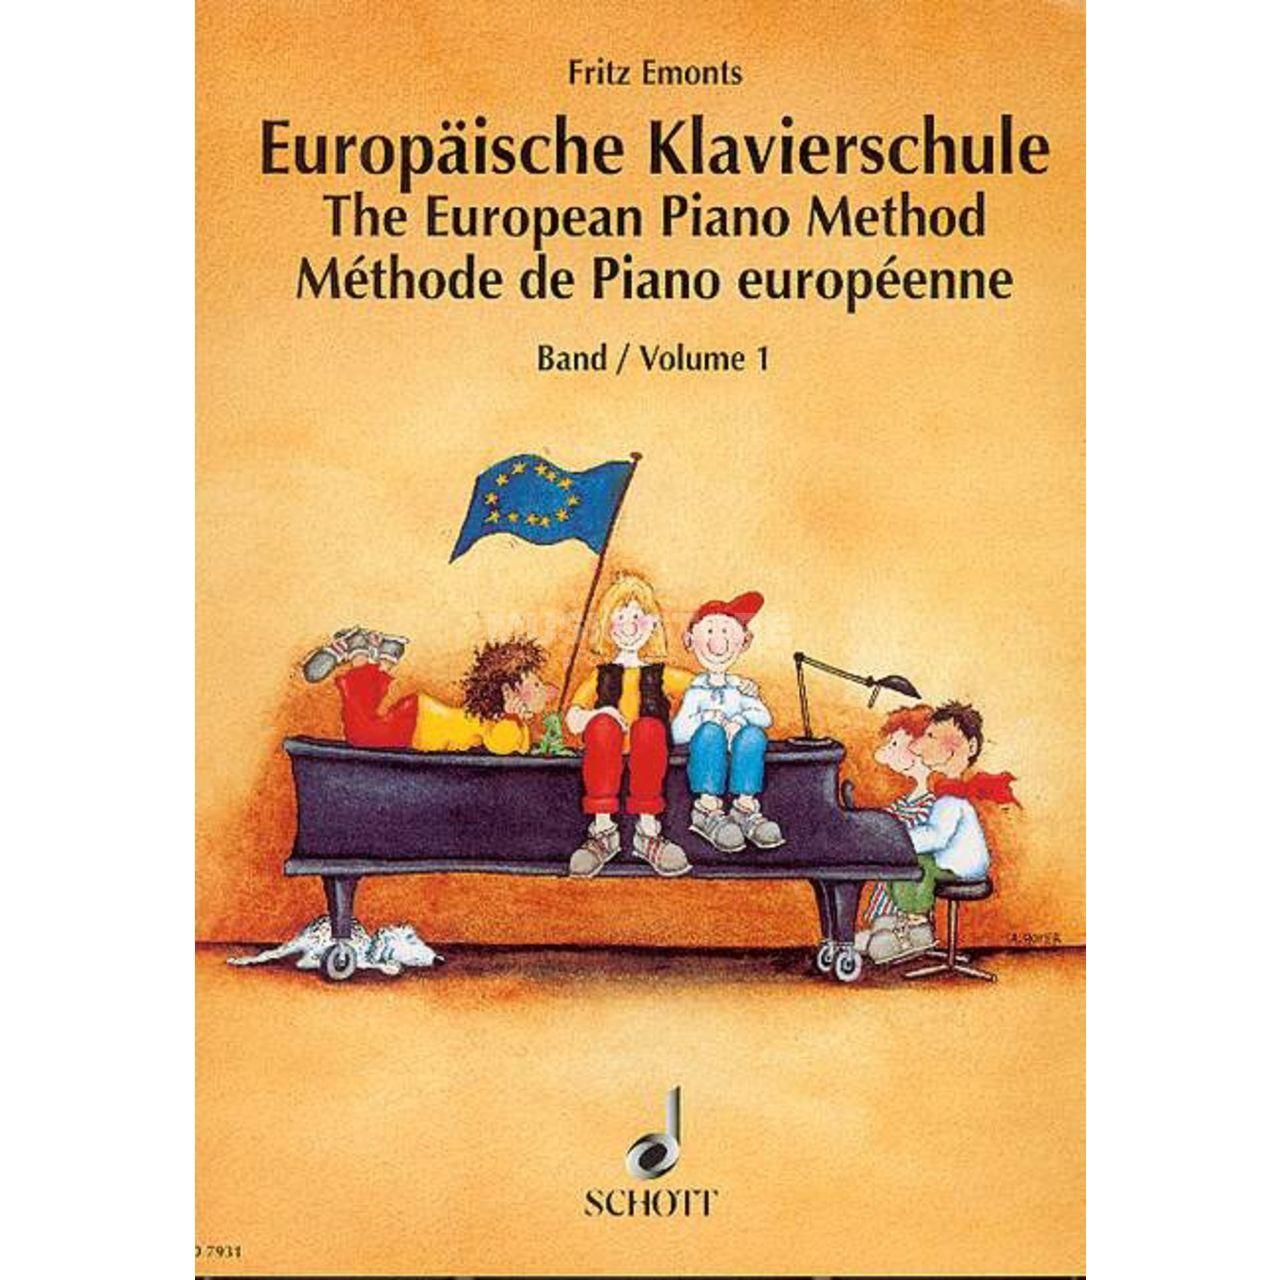 Schott Music Europäische Klavierschule 1 Fritz Emonts Music Store Professional Pt Ot